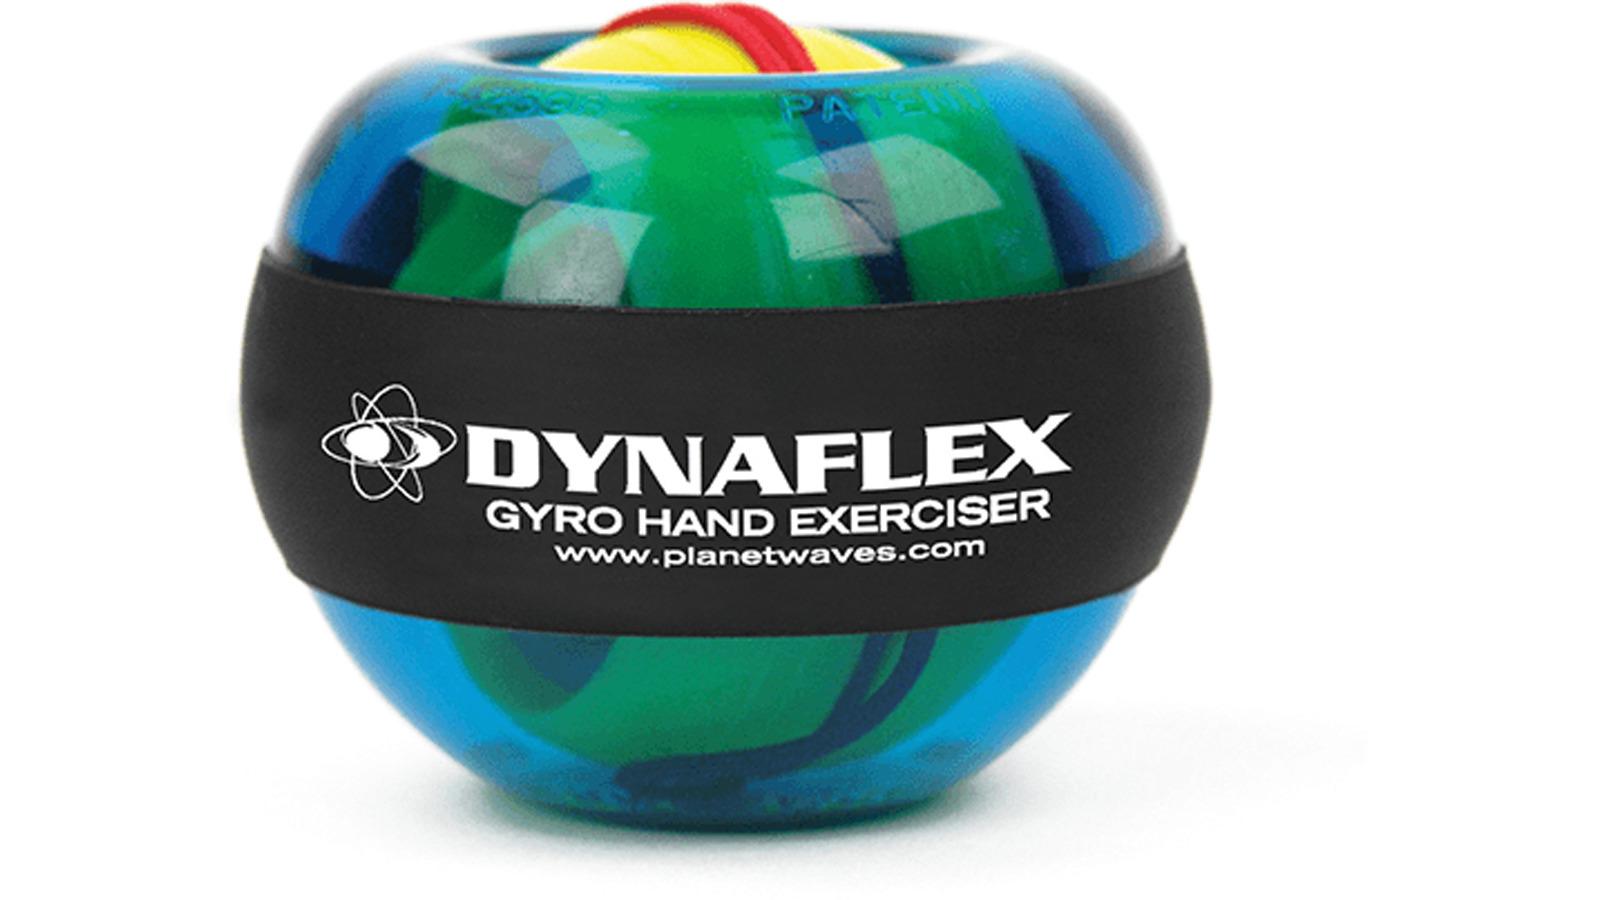 D'Addario Planet Waves Dynaflex Gyro Hand Exerciser PW-DFP-01